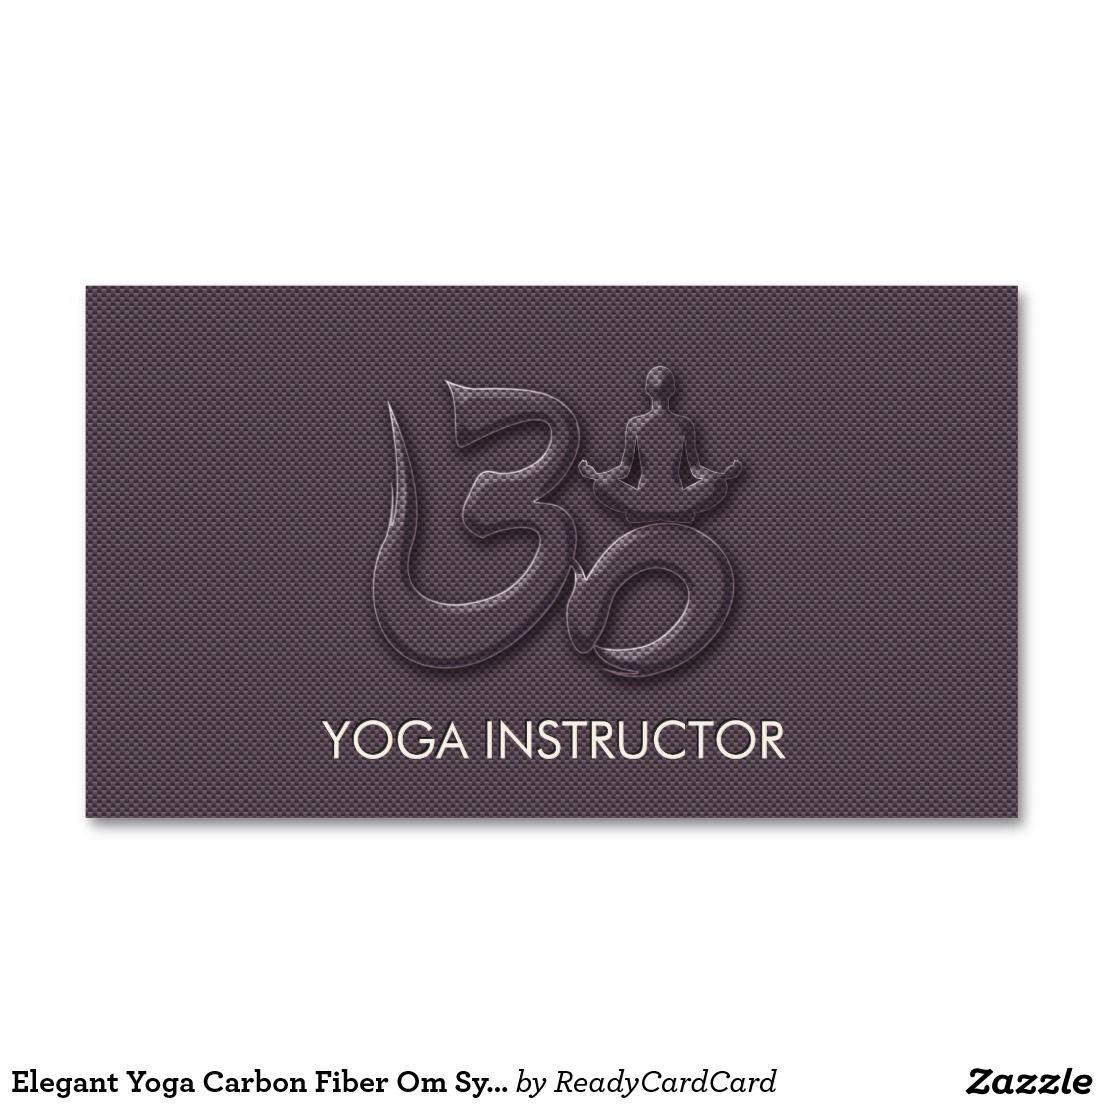 Elegant Yoga Carbon Fiber Om Symbol Business Card | YOGA ...